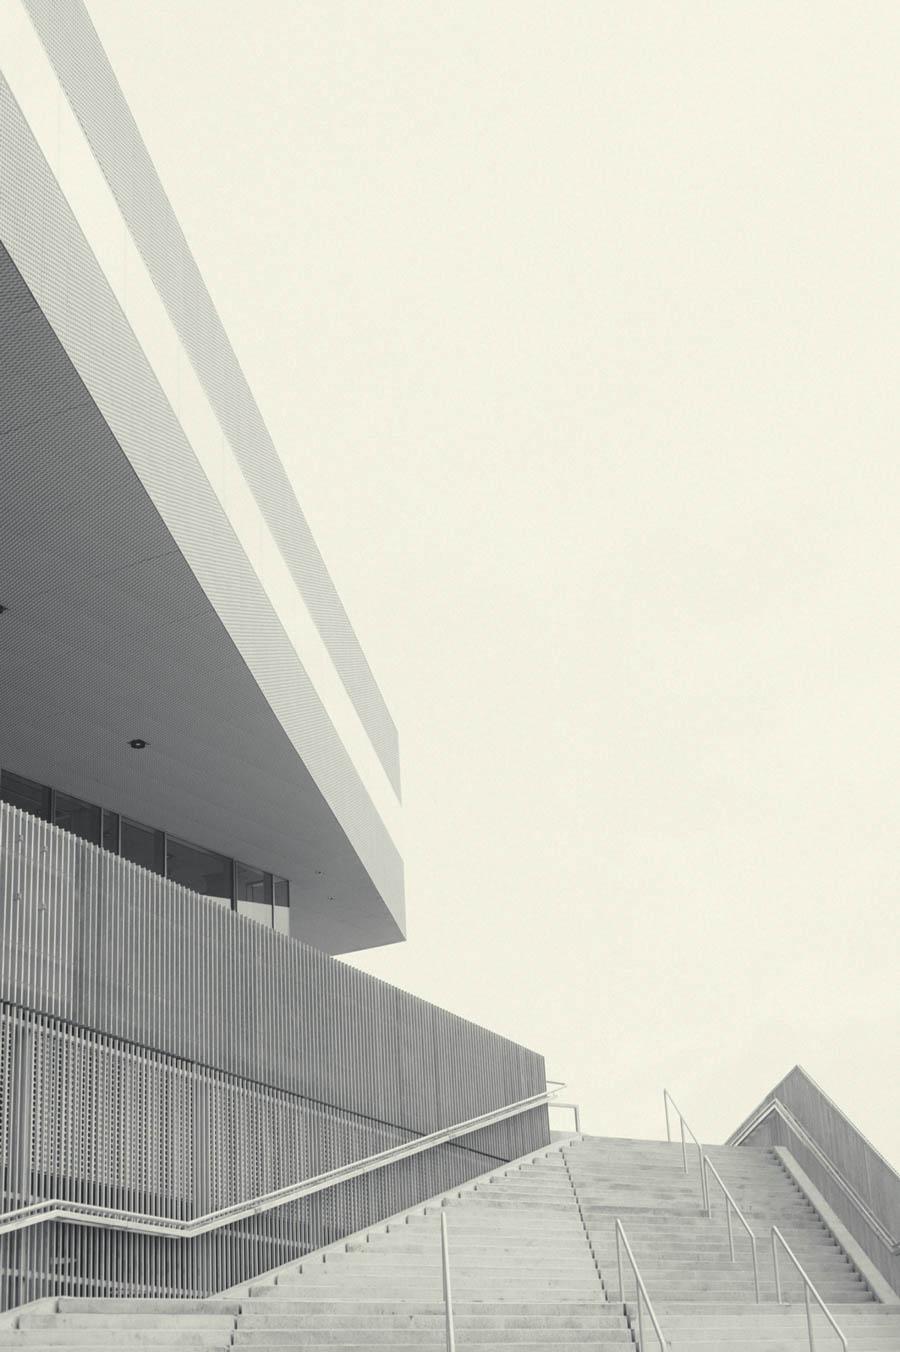 Dokk1 by Kim Høltermand